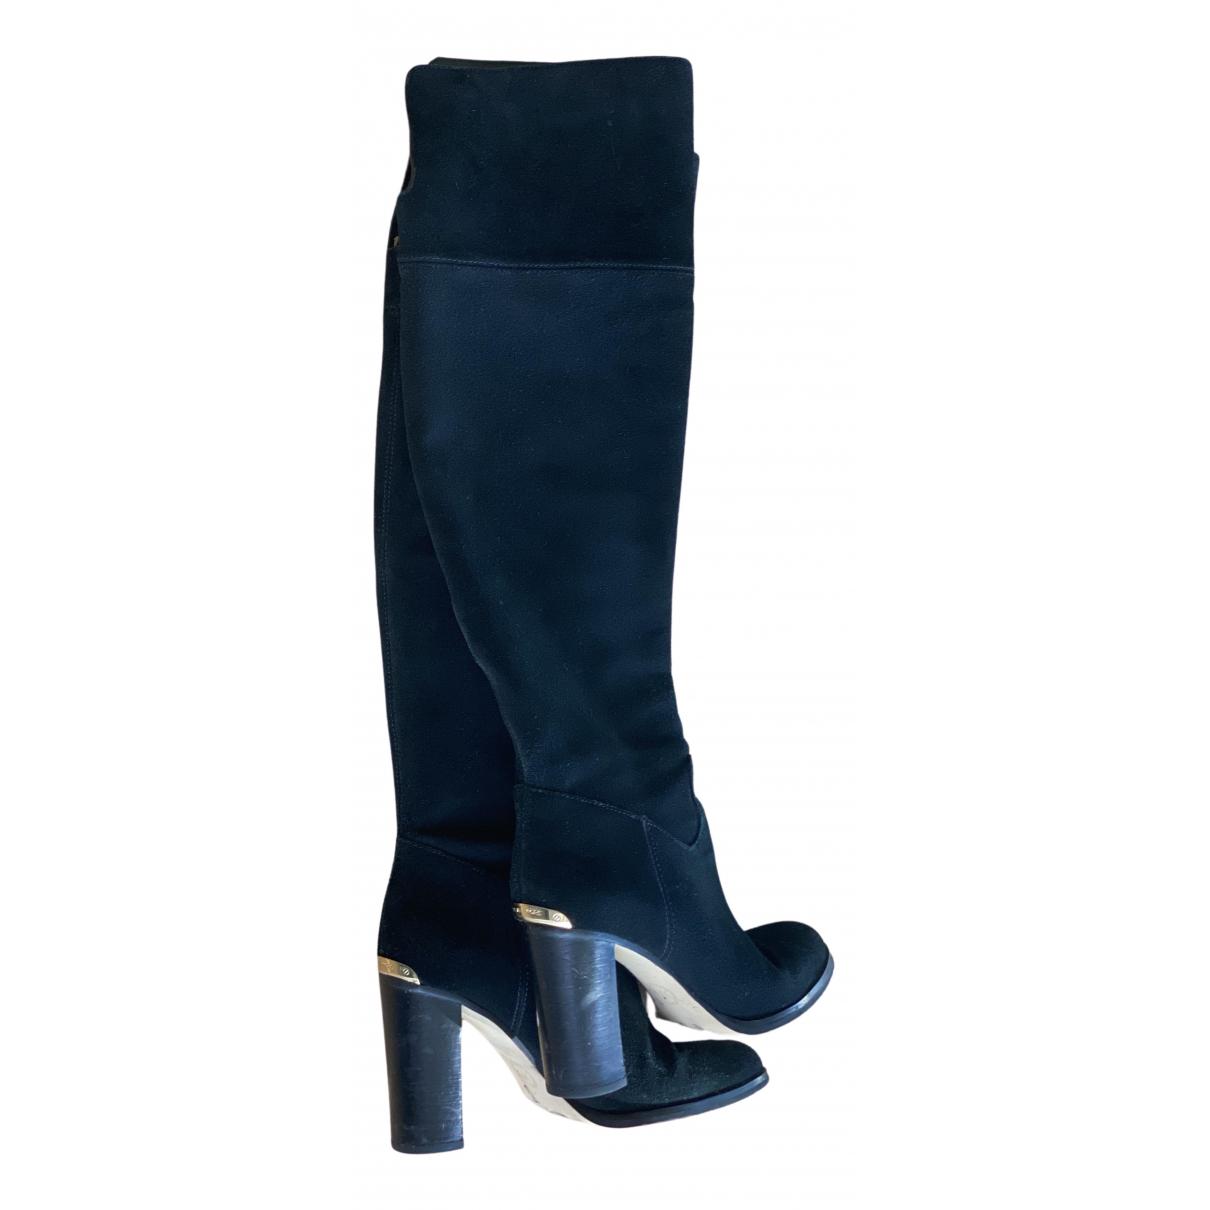 Michael Kors \N Black Suede Boots for Women 37.5 EU